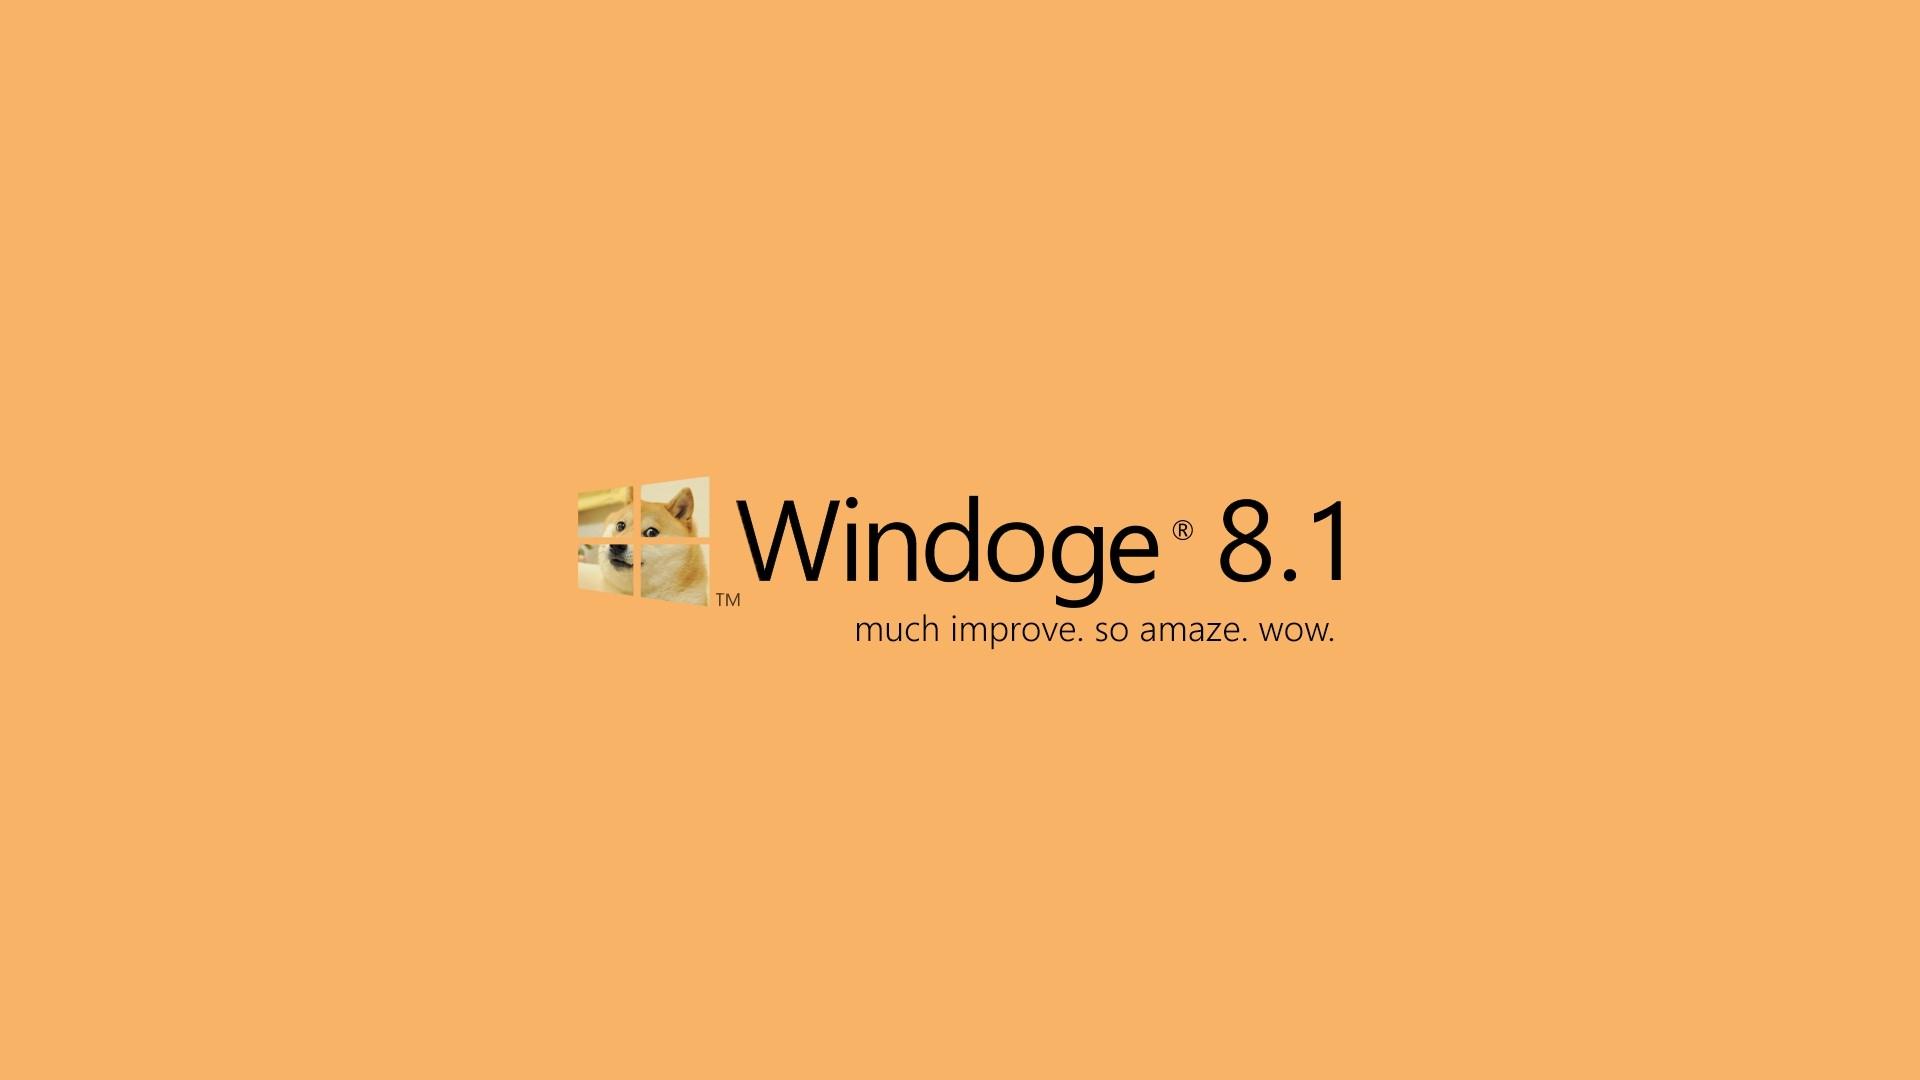 p.35, Microsoft Windows 10 Wallpapers HD, Microsoft Windows 10 HD .